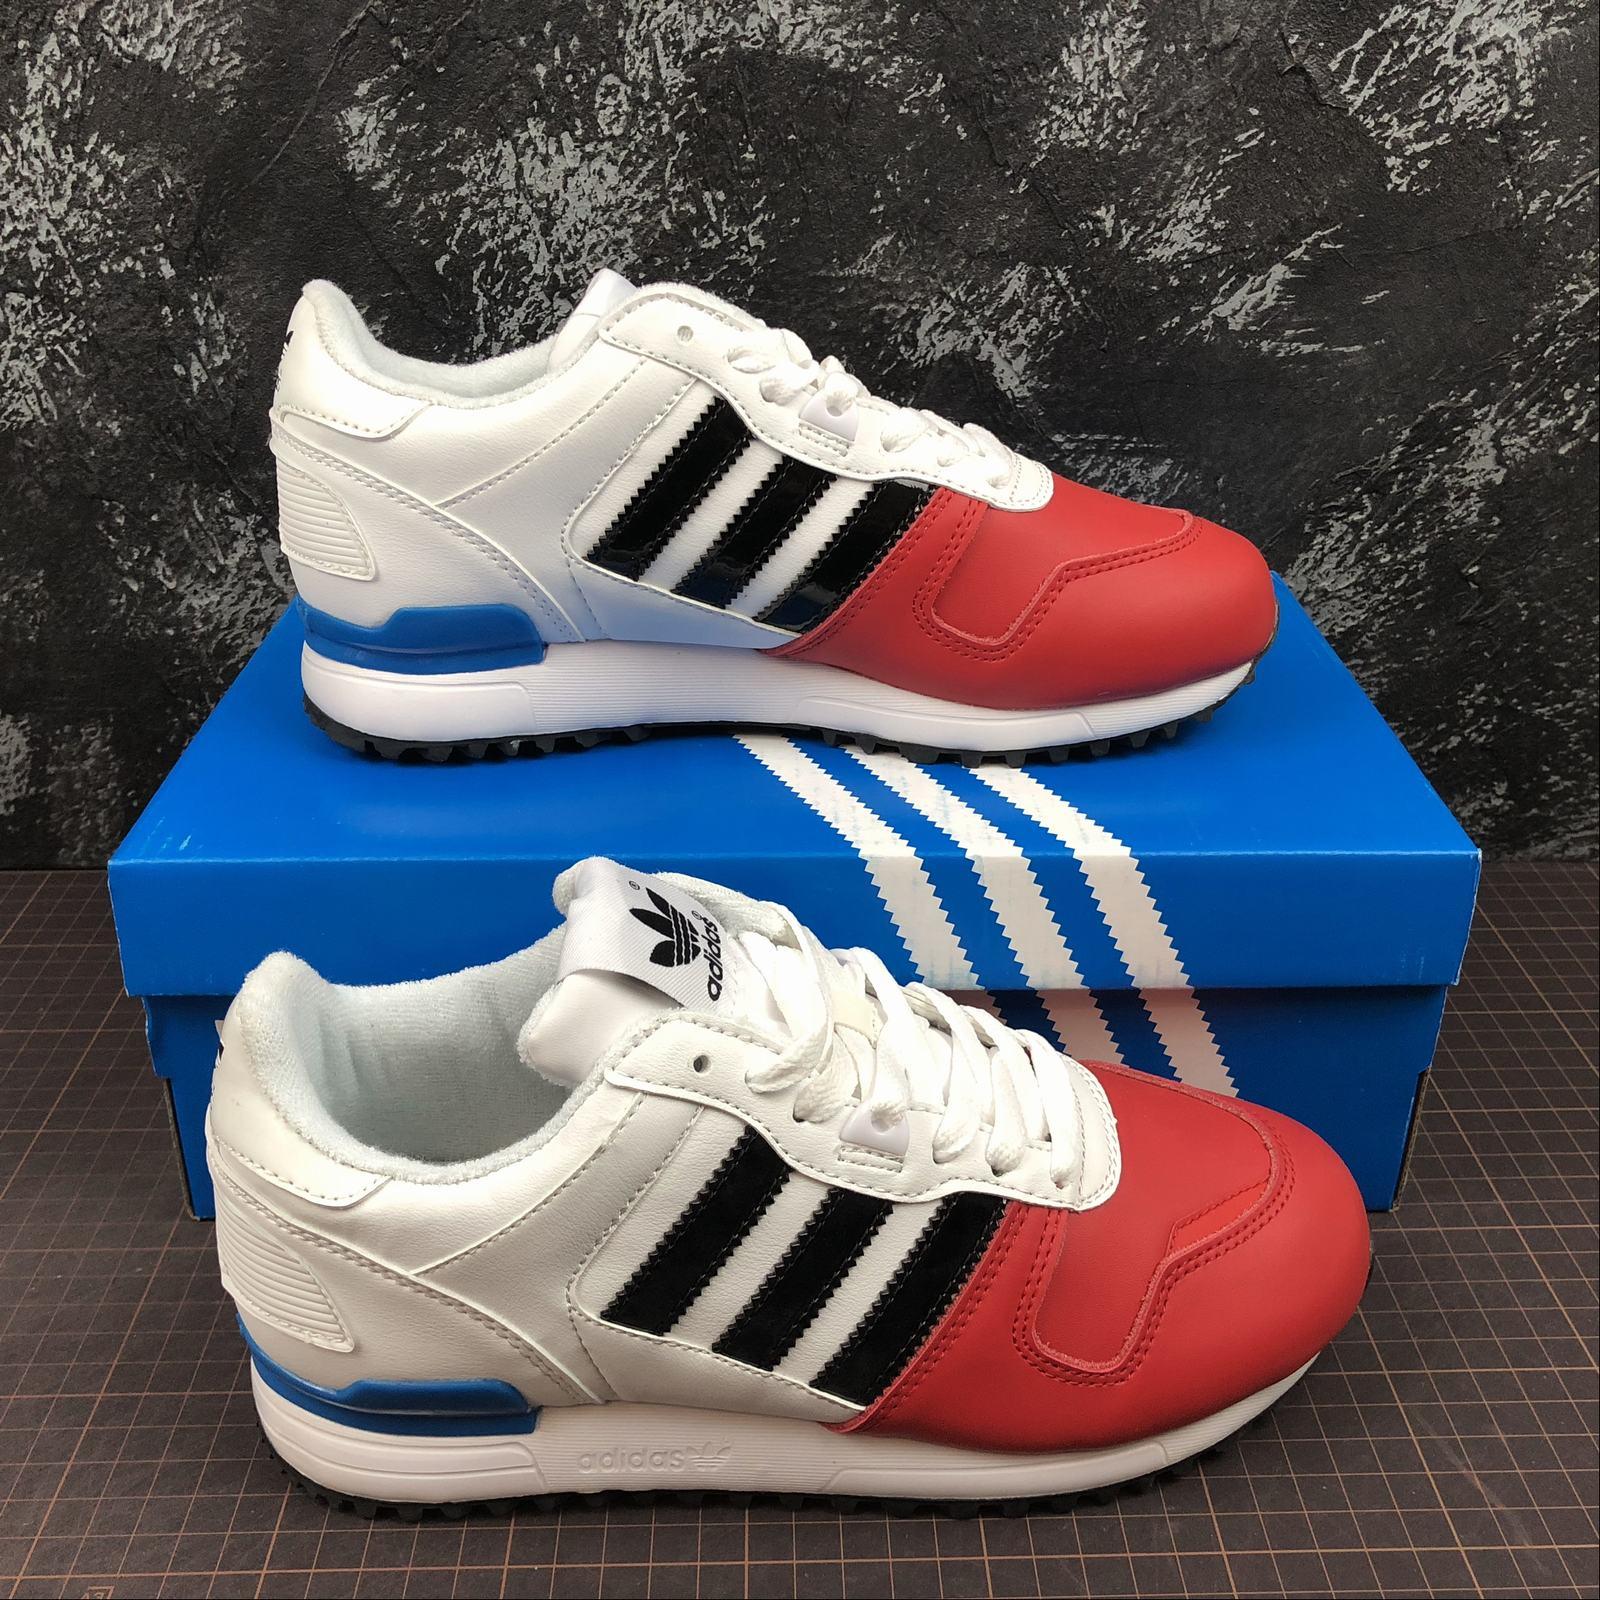 giay-sneaker-adidas-zx700-aq5316